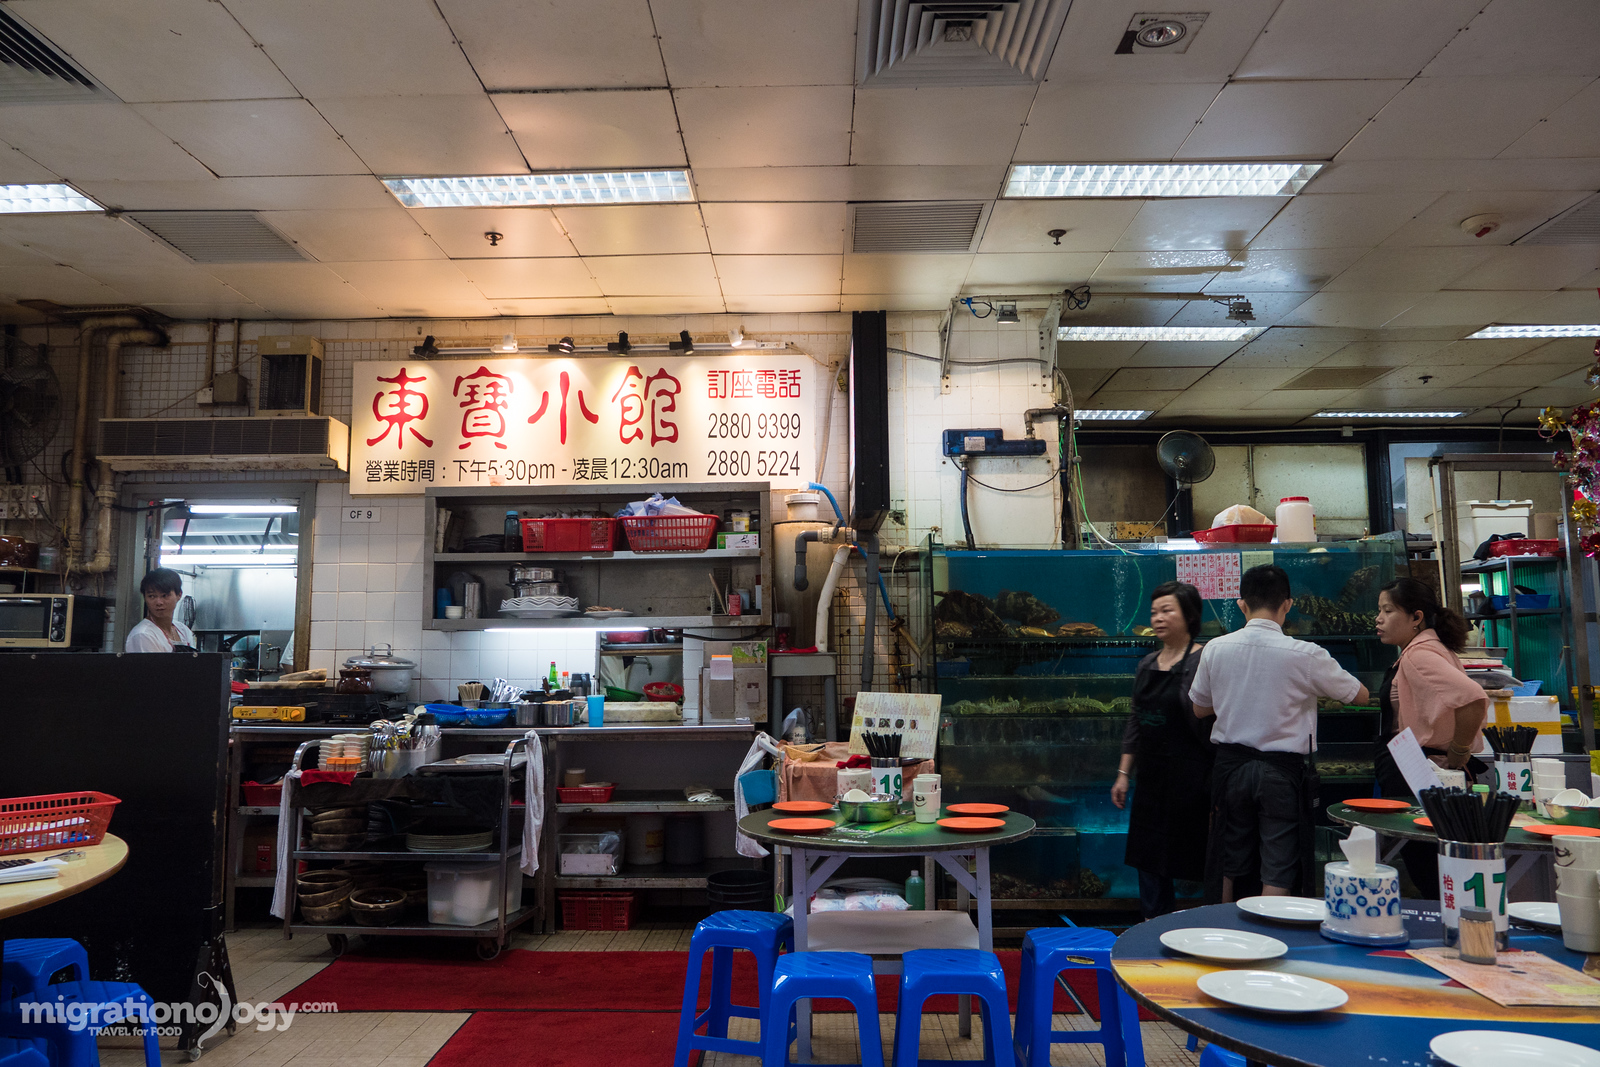 Tung Po Restaurant (東寶小館) in Hong Kong